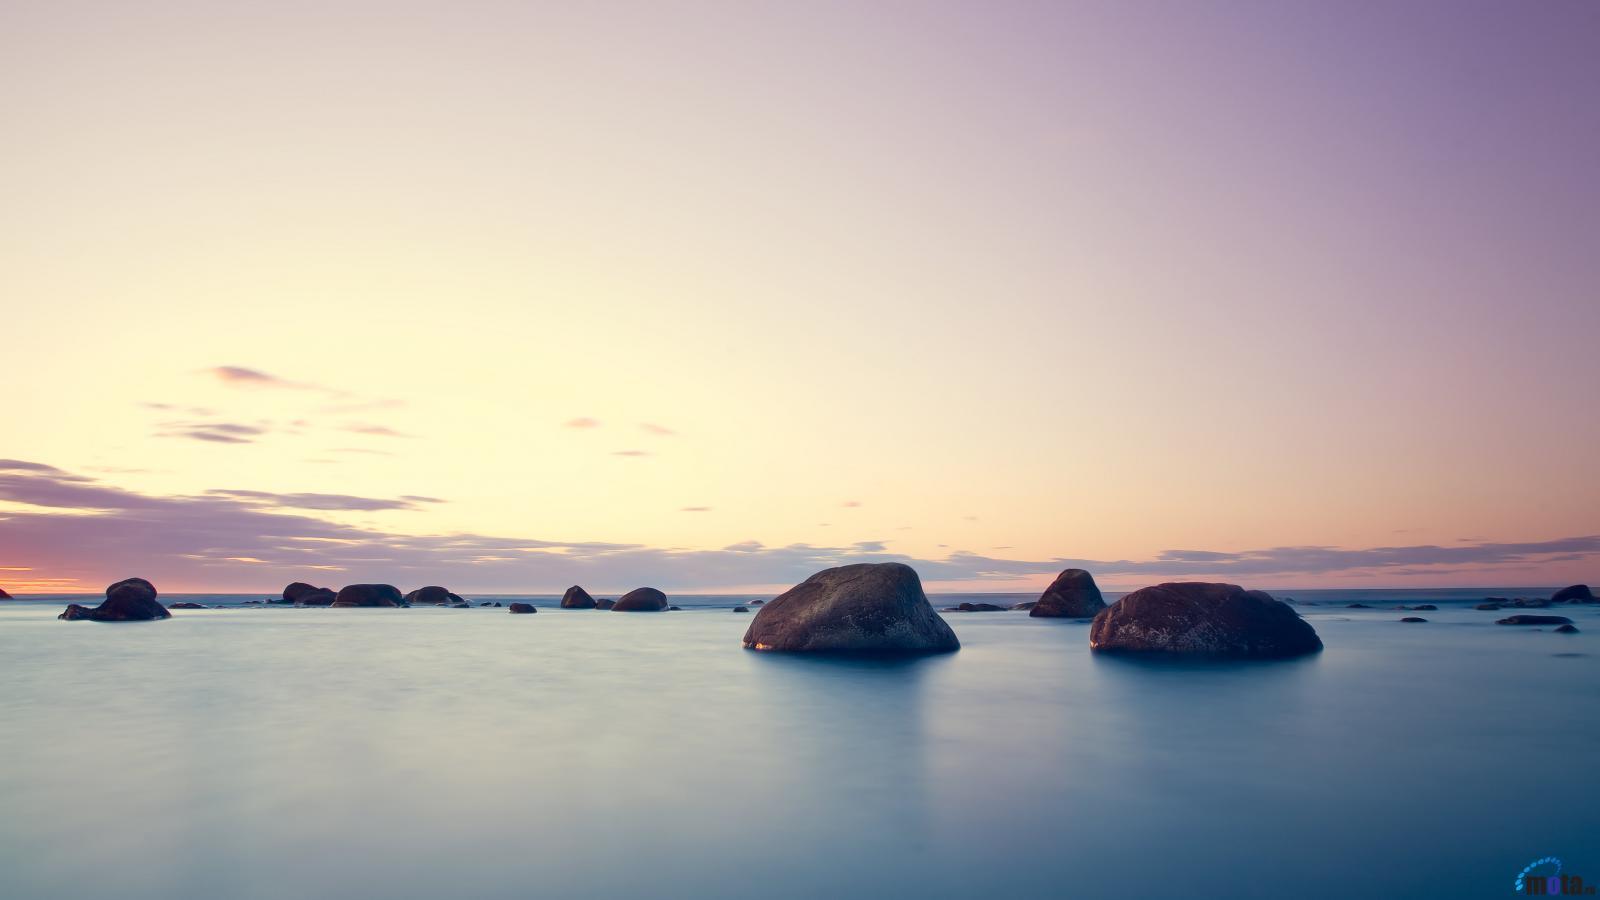 Wallpaper Stones in the calm sea 1600 x 900 widescreen Desktop 1600x900